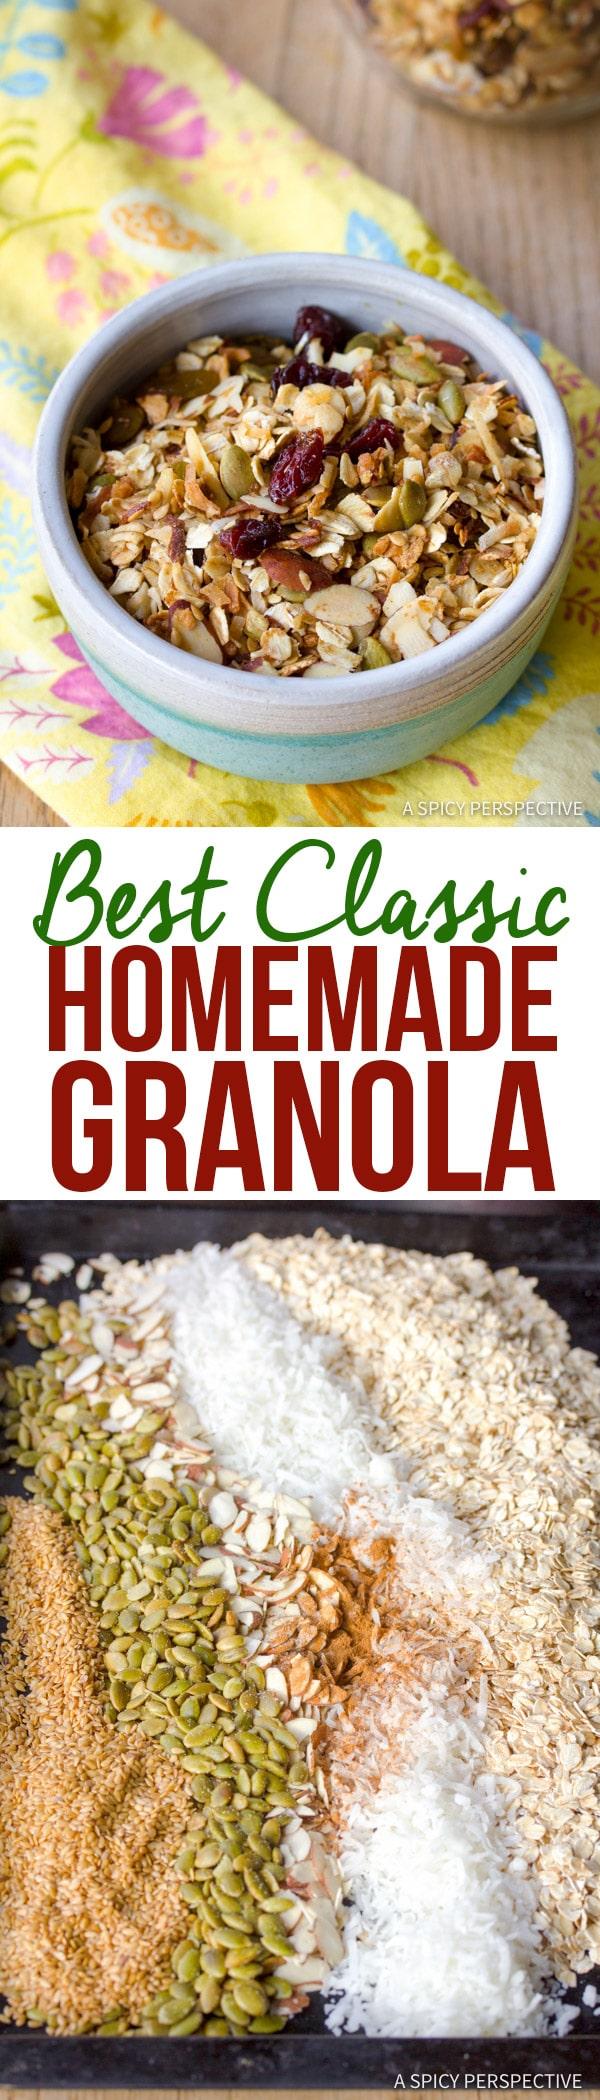 Best Classic Homemade Granola Recipe | ASpicyPerspective.com